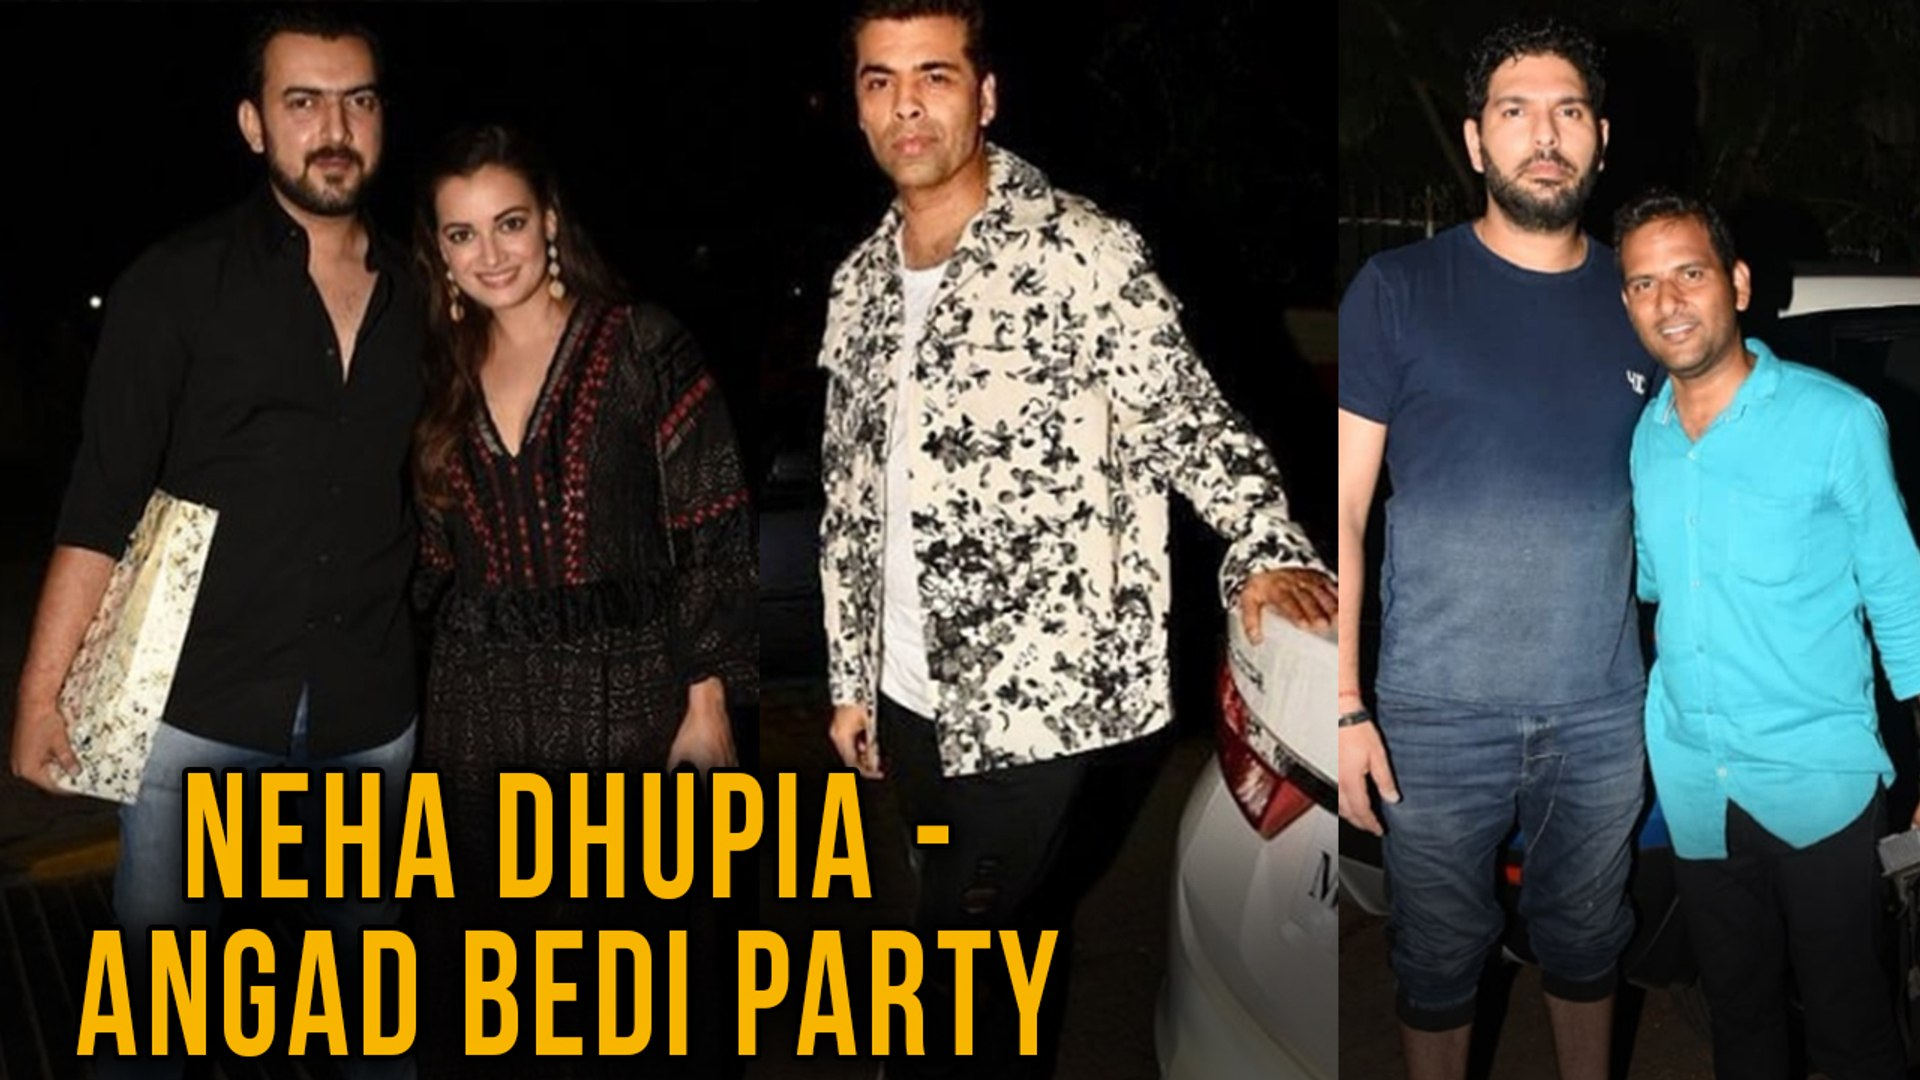 Neha Dhupia - Angad Bedi Host Party For Stars | Karan Johar, Yuvraj Singh And Dia Mirza